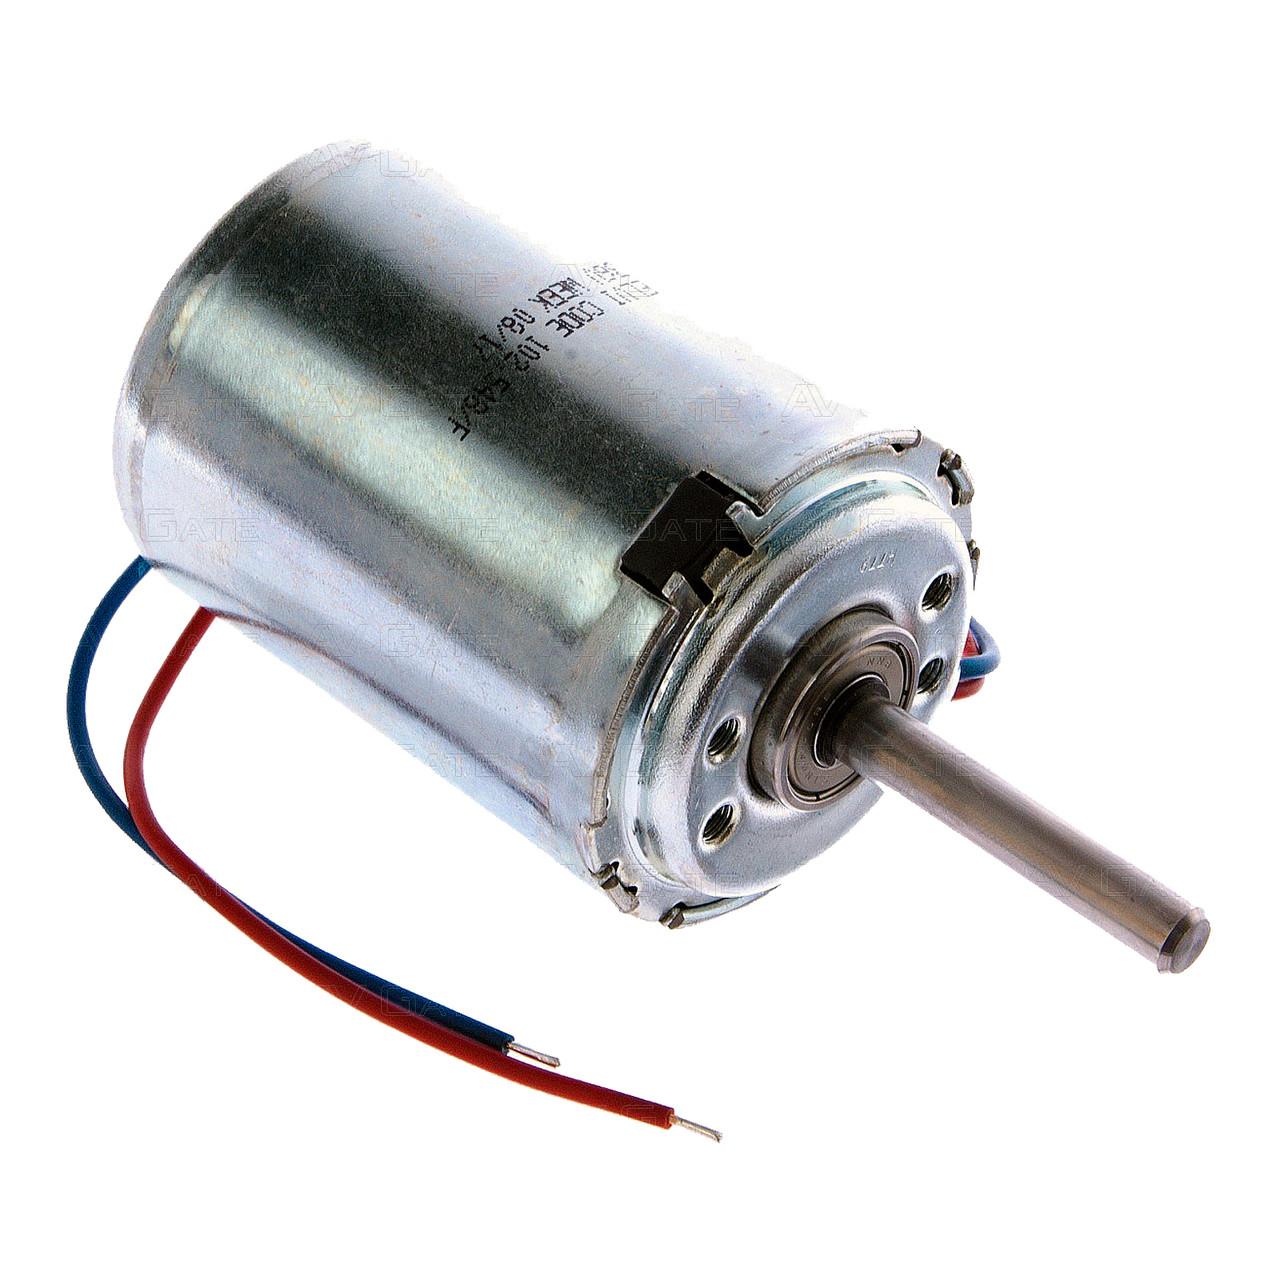 Электродвигатель WINGO / TOONA 24V Nice MDC1788R01